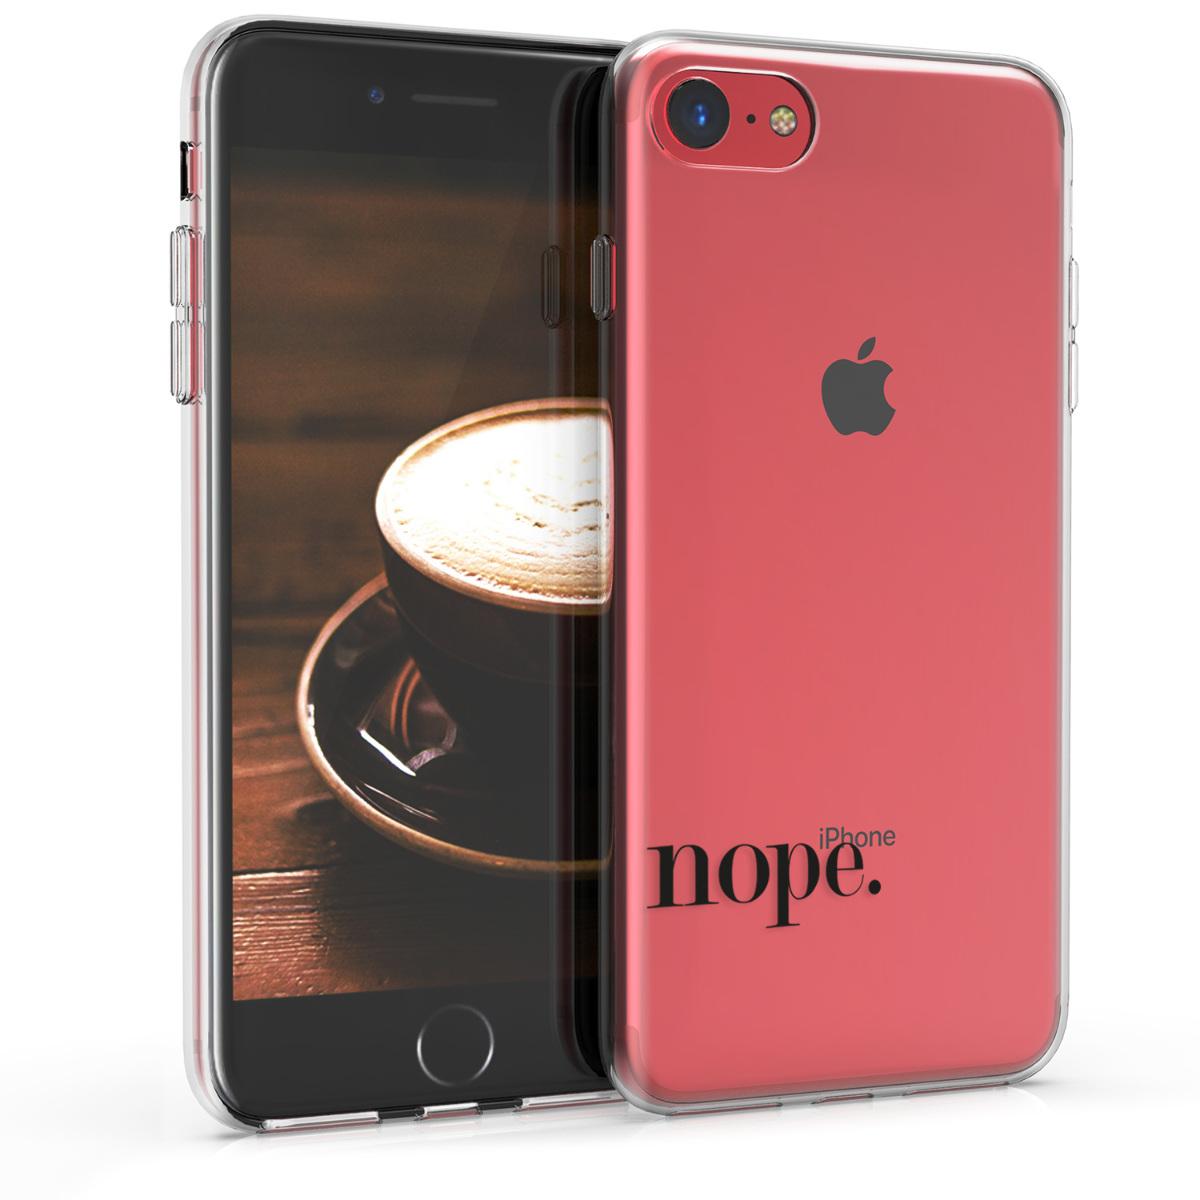 Kvalitní silikonové TPU pouzdro pro Apple iPhone 7 / 8 / SE  - Ne Black | Transparent